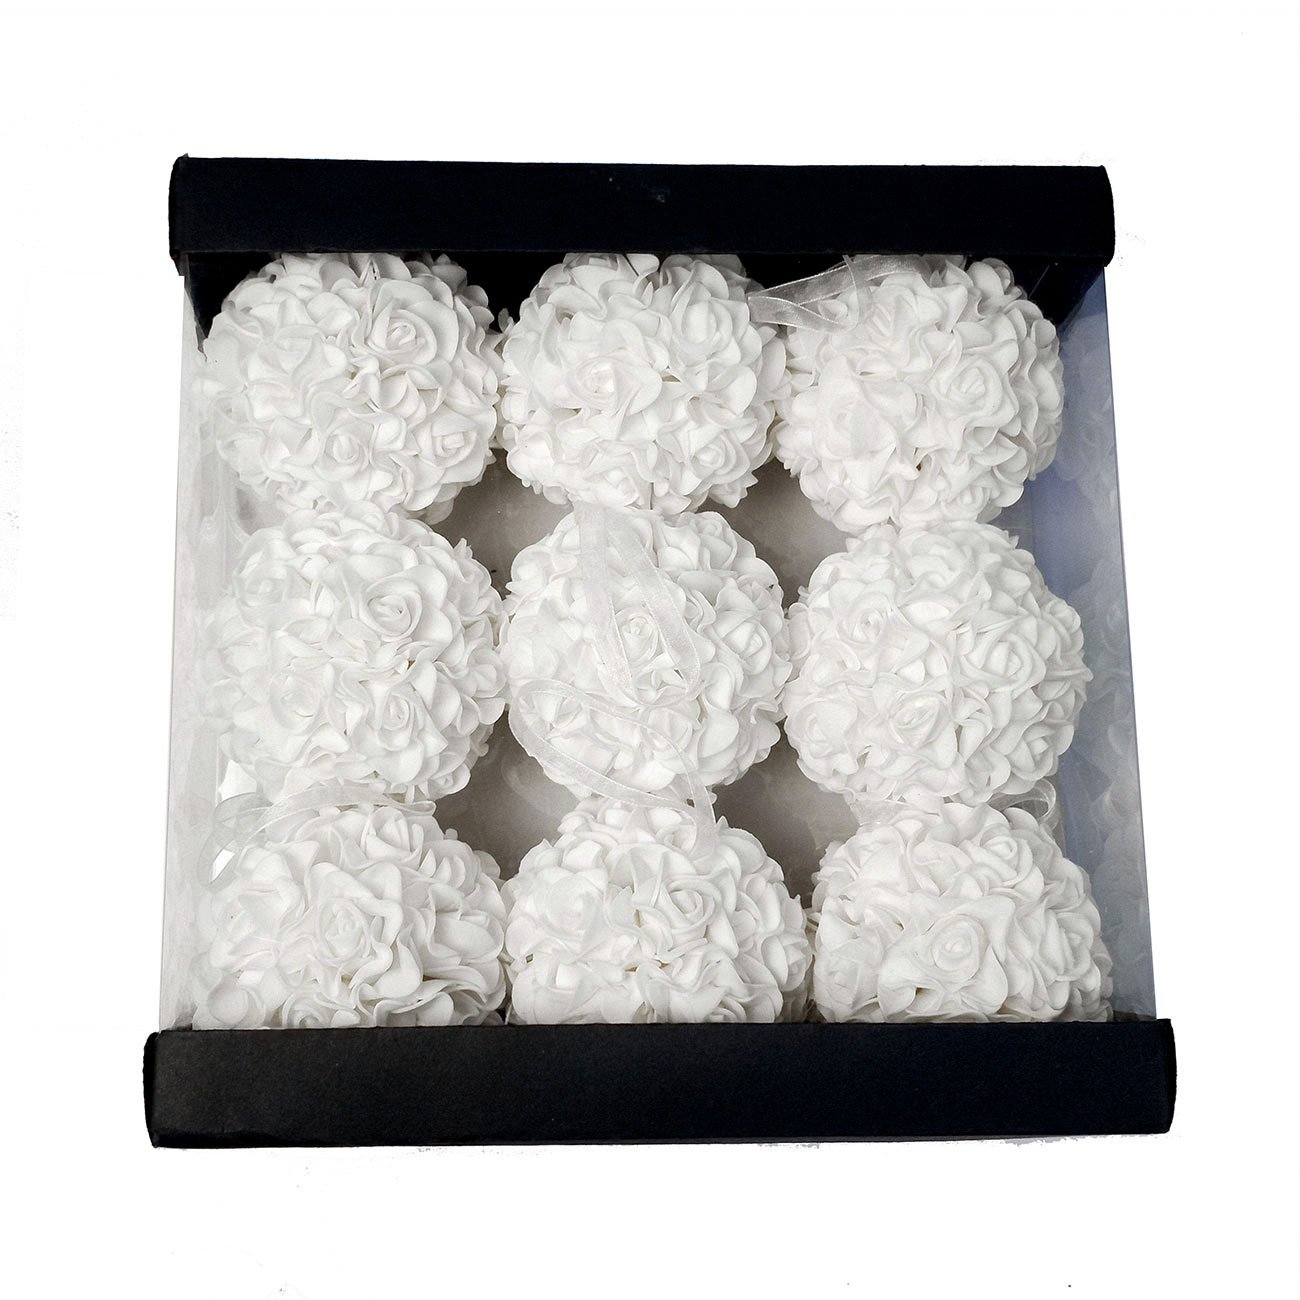 9pcs 3.5 Artificial Rose Satin Flower Foam Balls for Bridal Wedding Centerpiece Party Ceremony Decoration White WMAOT